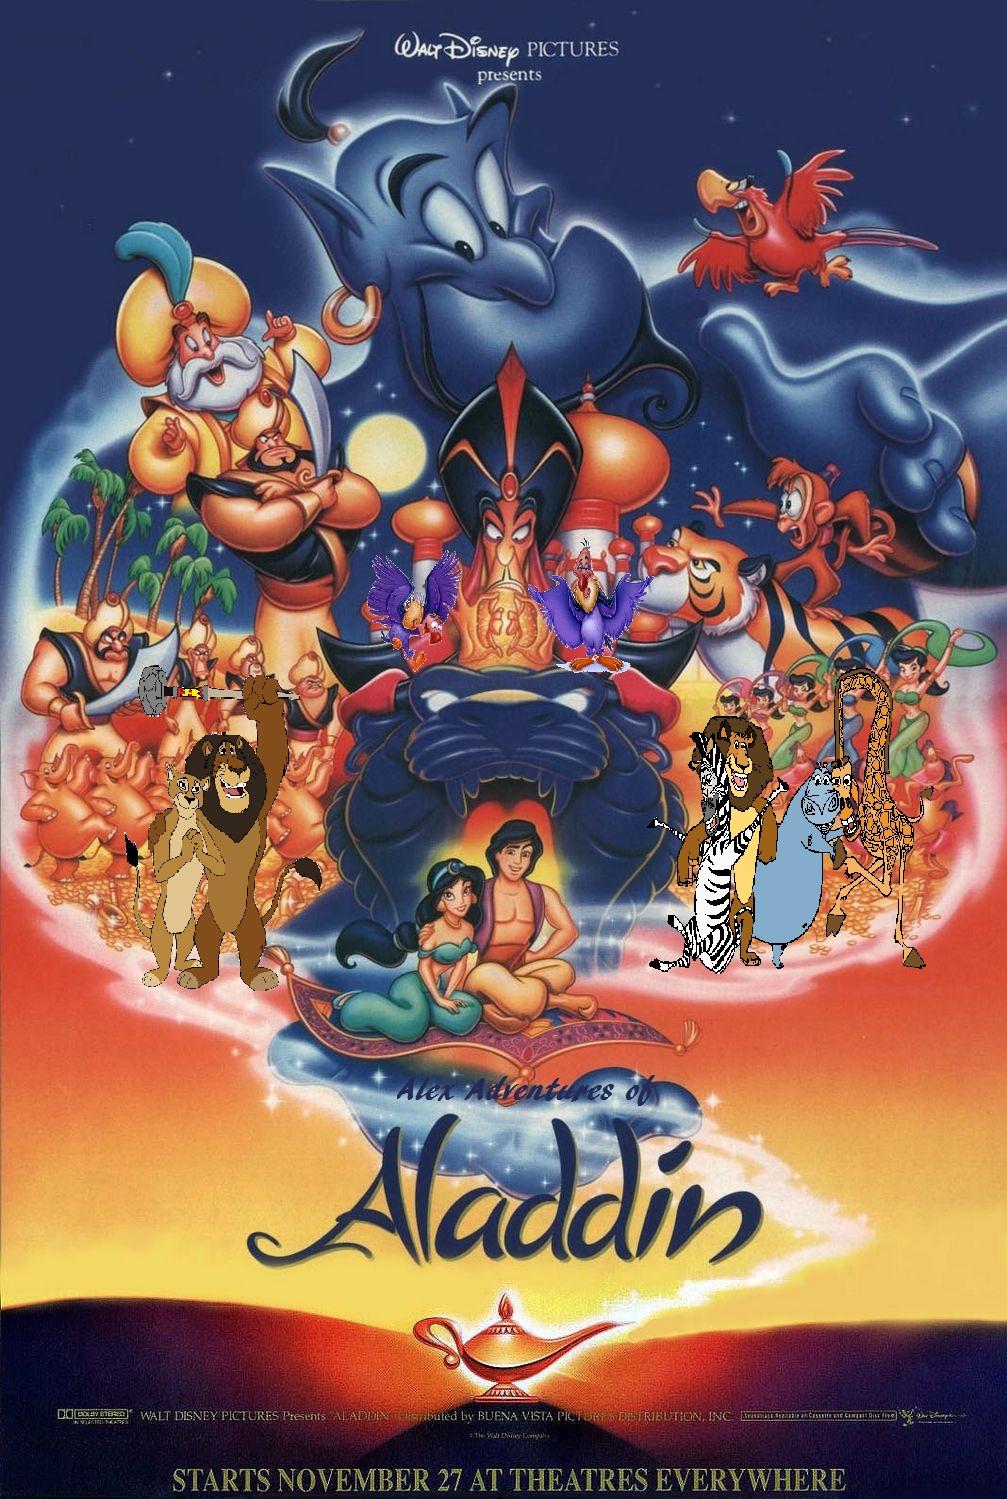 Alex's Adventures of Aladdin